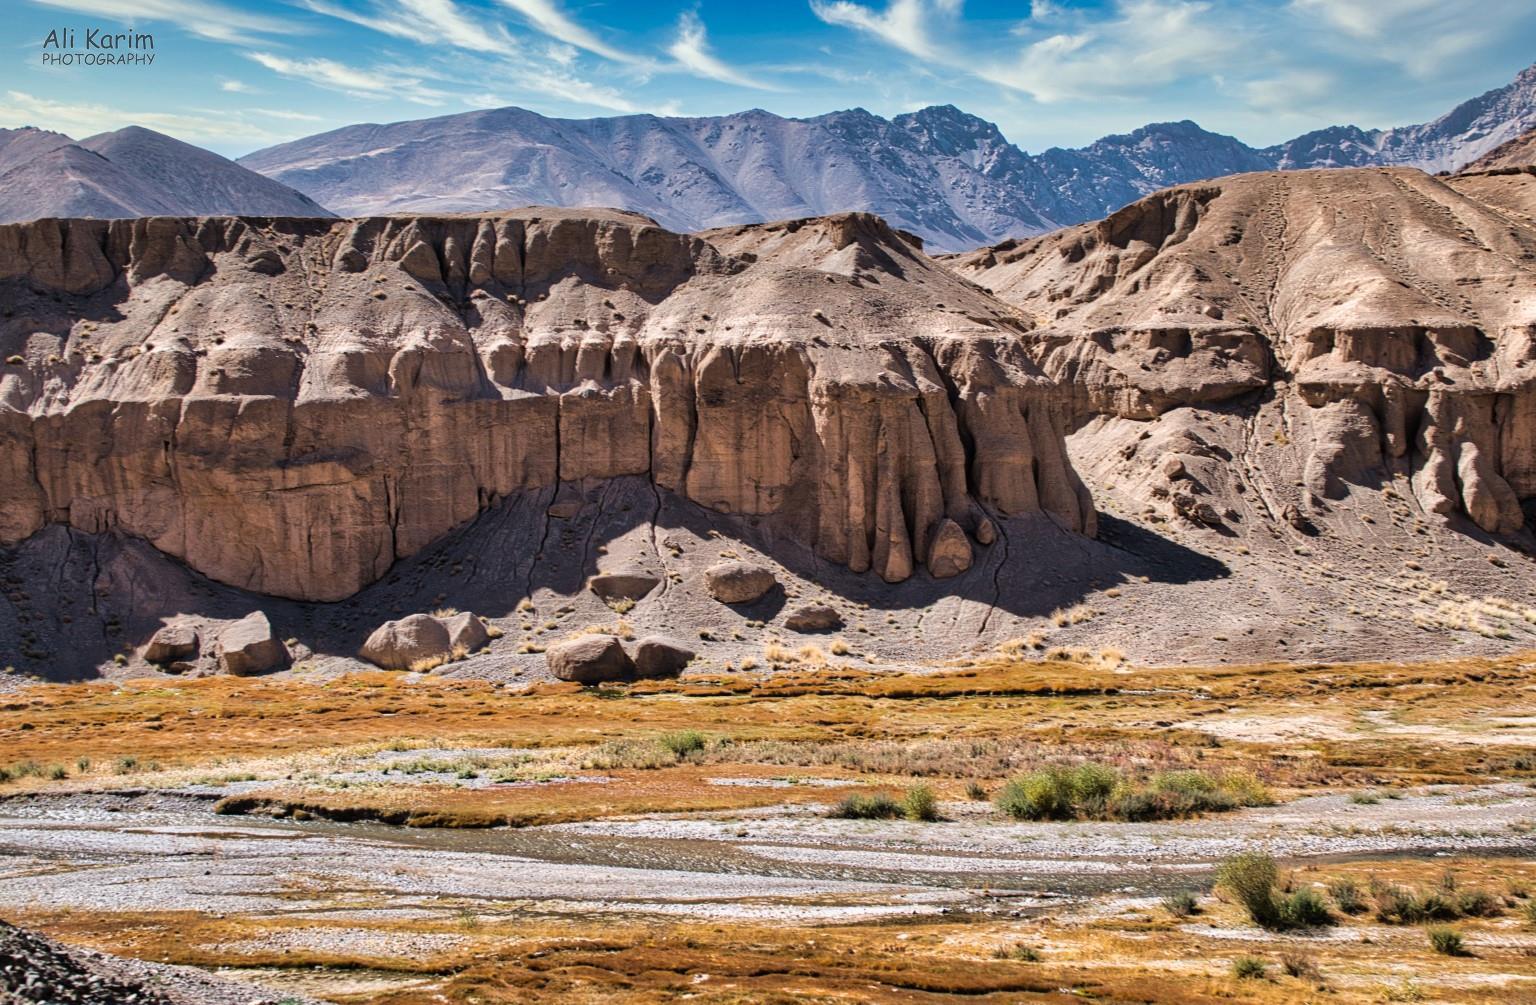 More Murghab & Alichur, Tajikistan, Interesting landscape